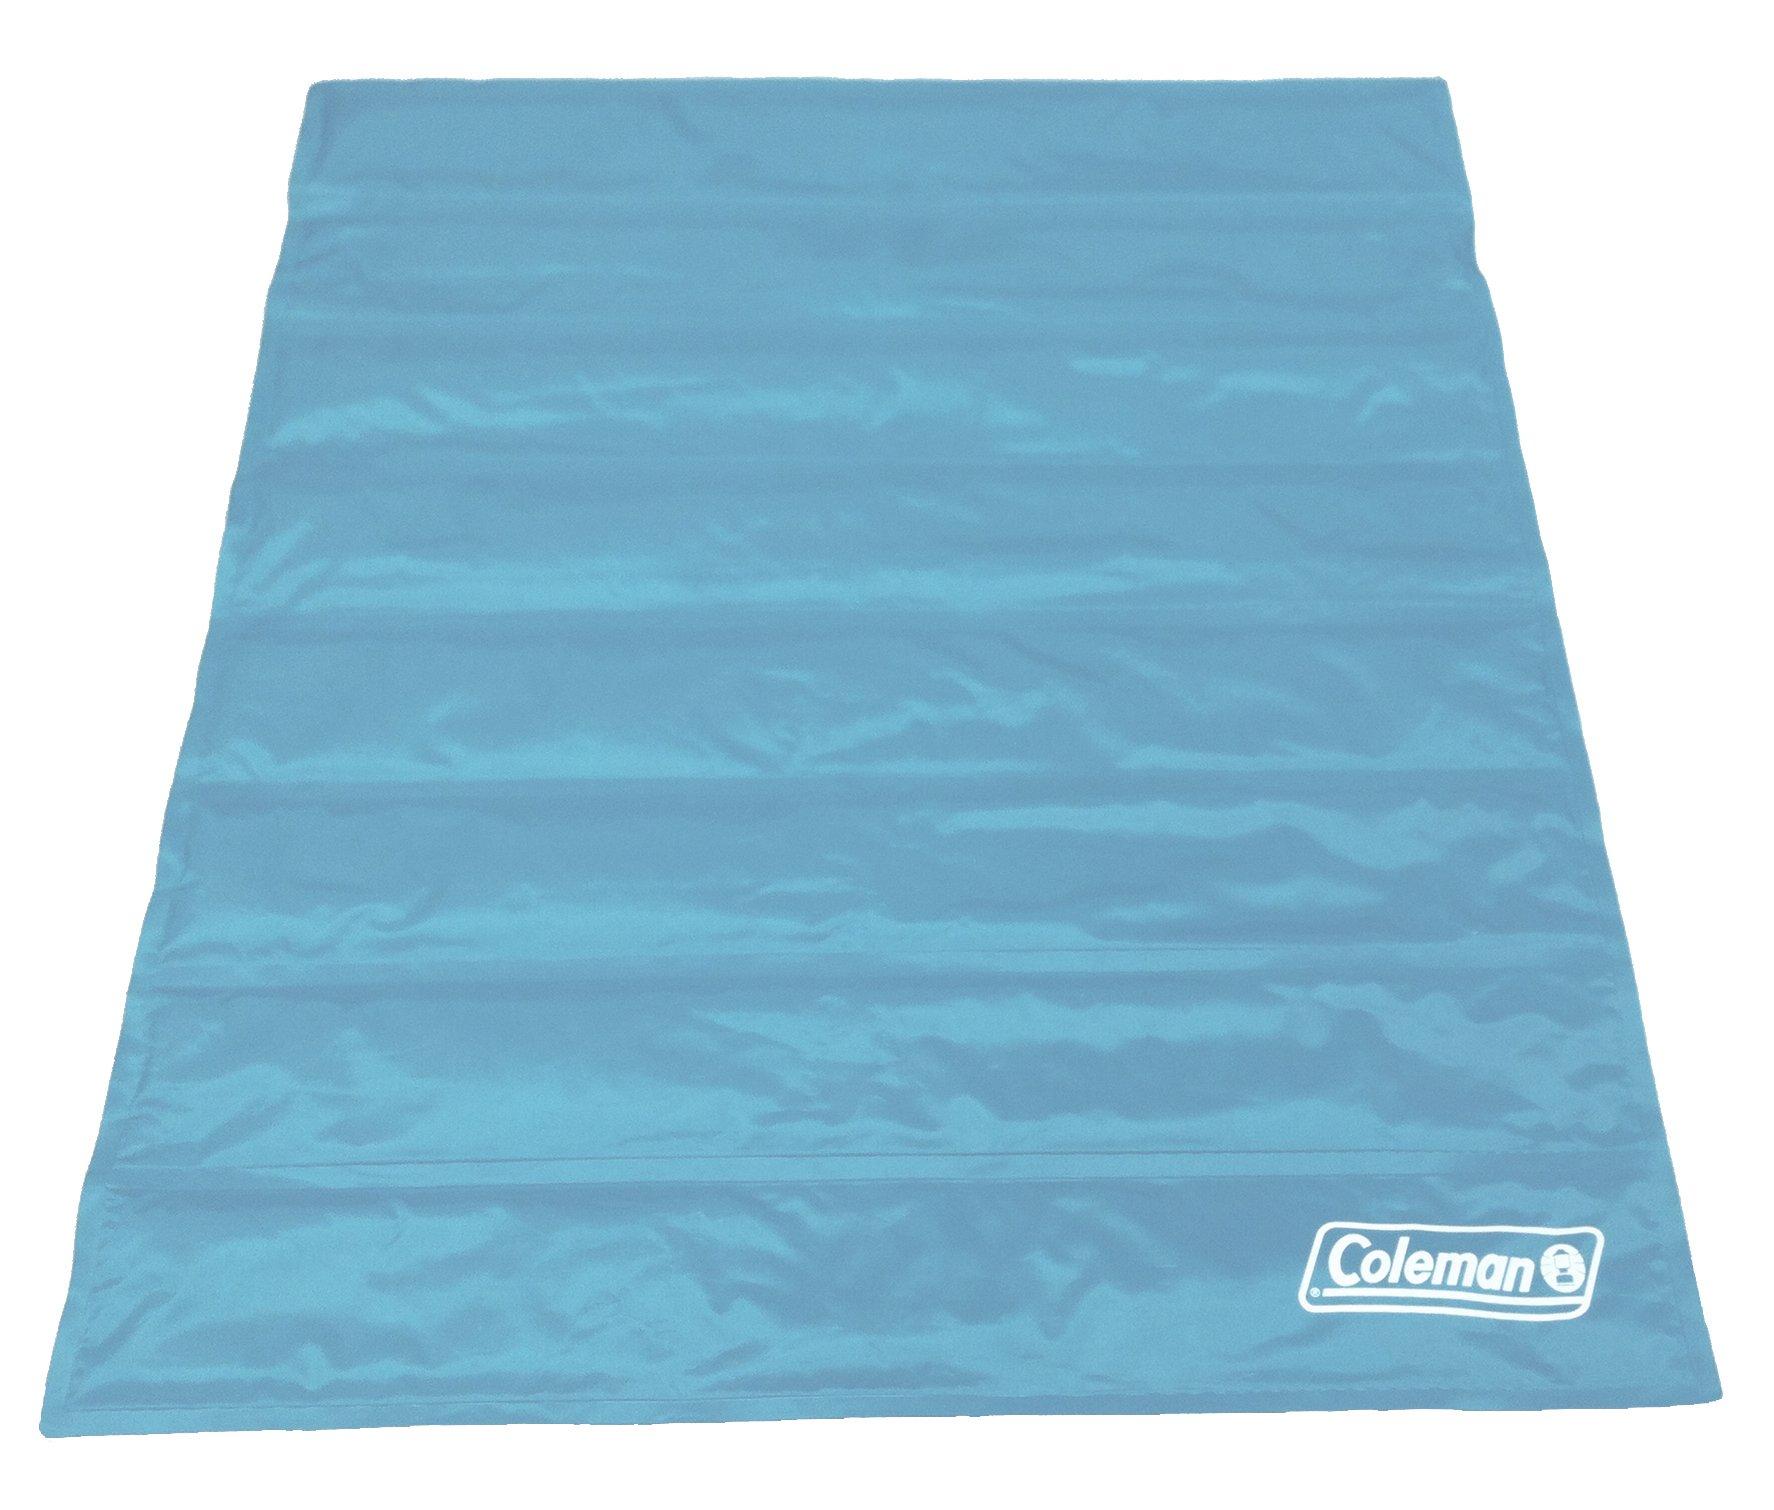 Coleman Comfort Cooling Gel Pet Pad Mat in Medium 24''x30'', For Medium Pets (Blue) by Coleman (Image #2)